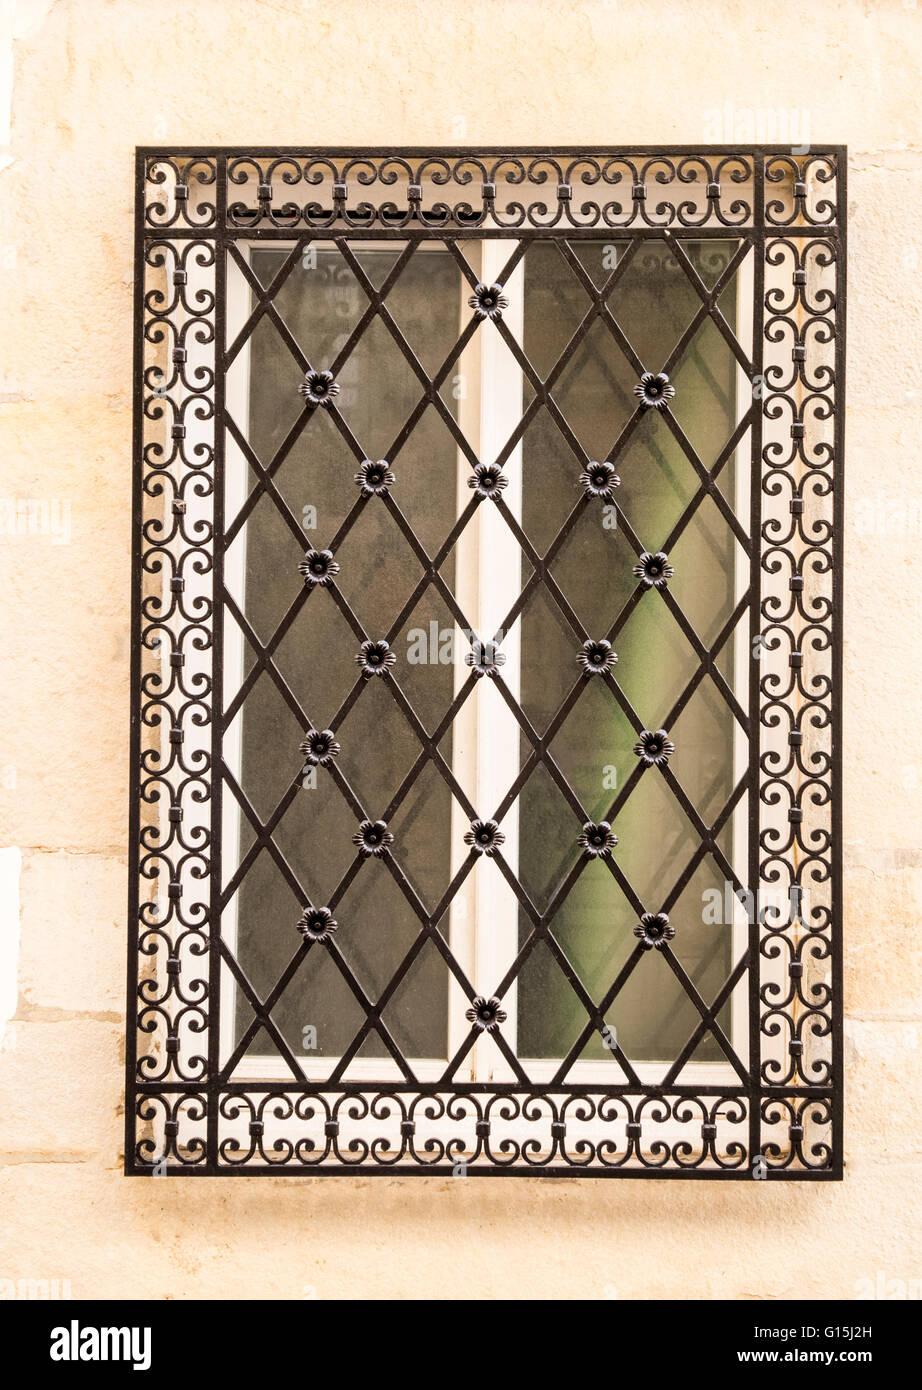 Decorative window grill Stock Photo: 104000809